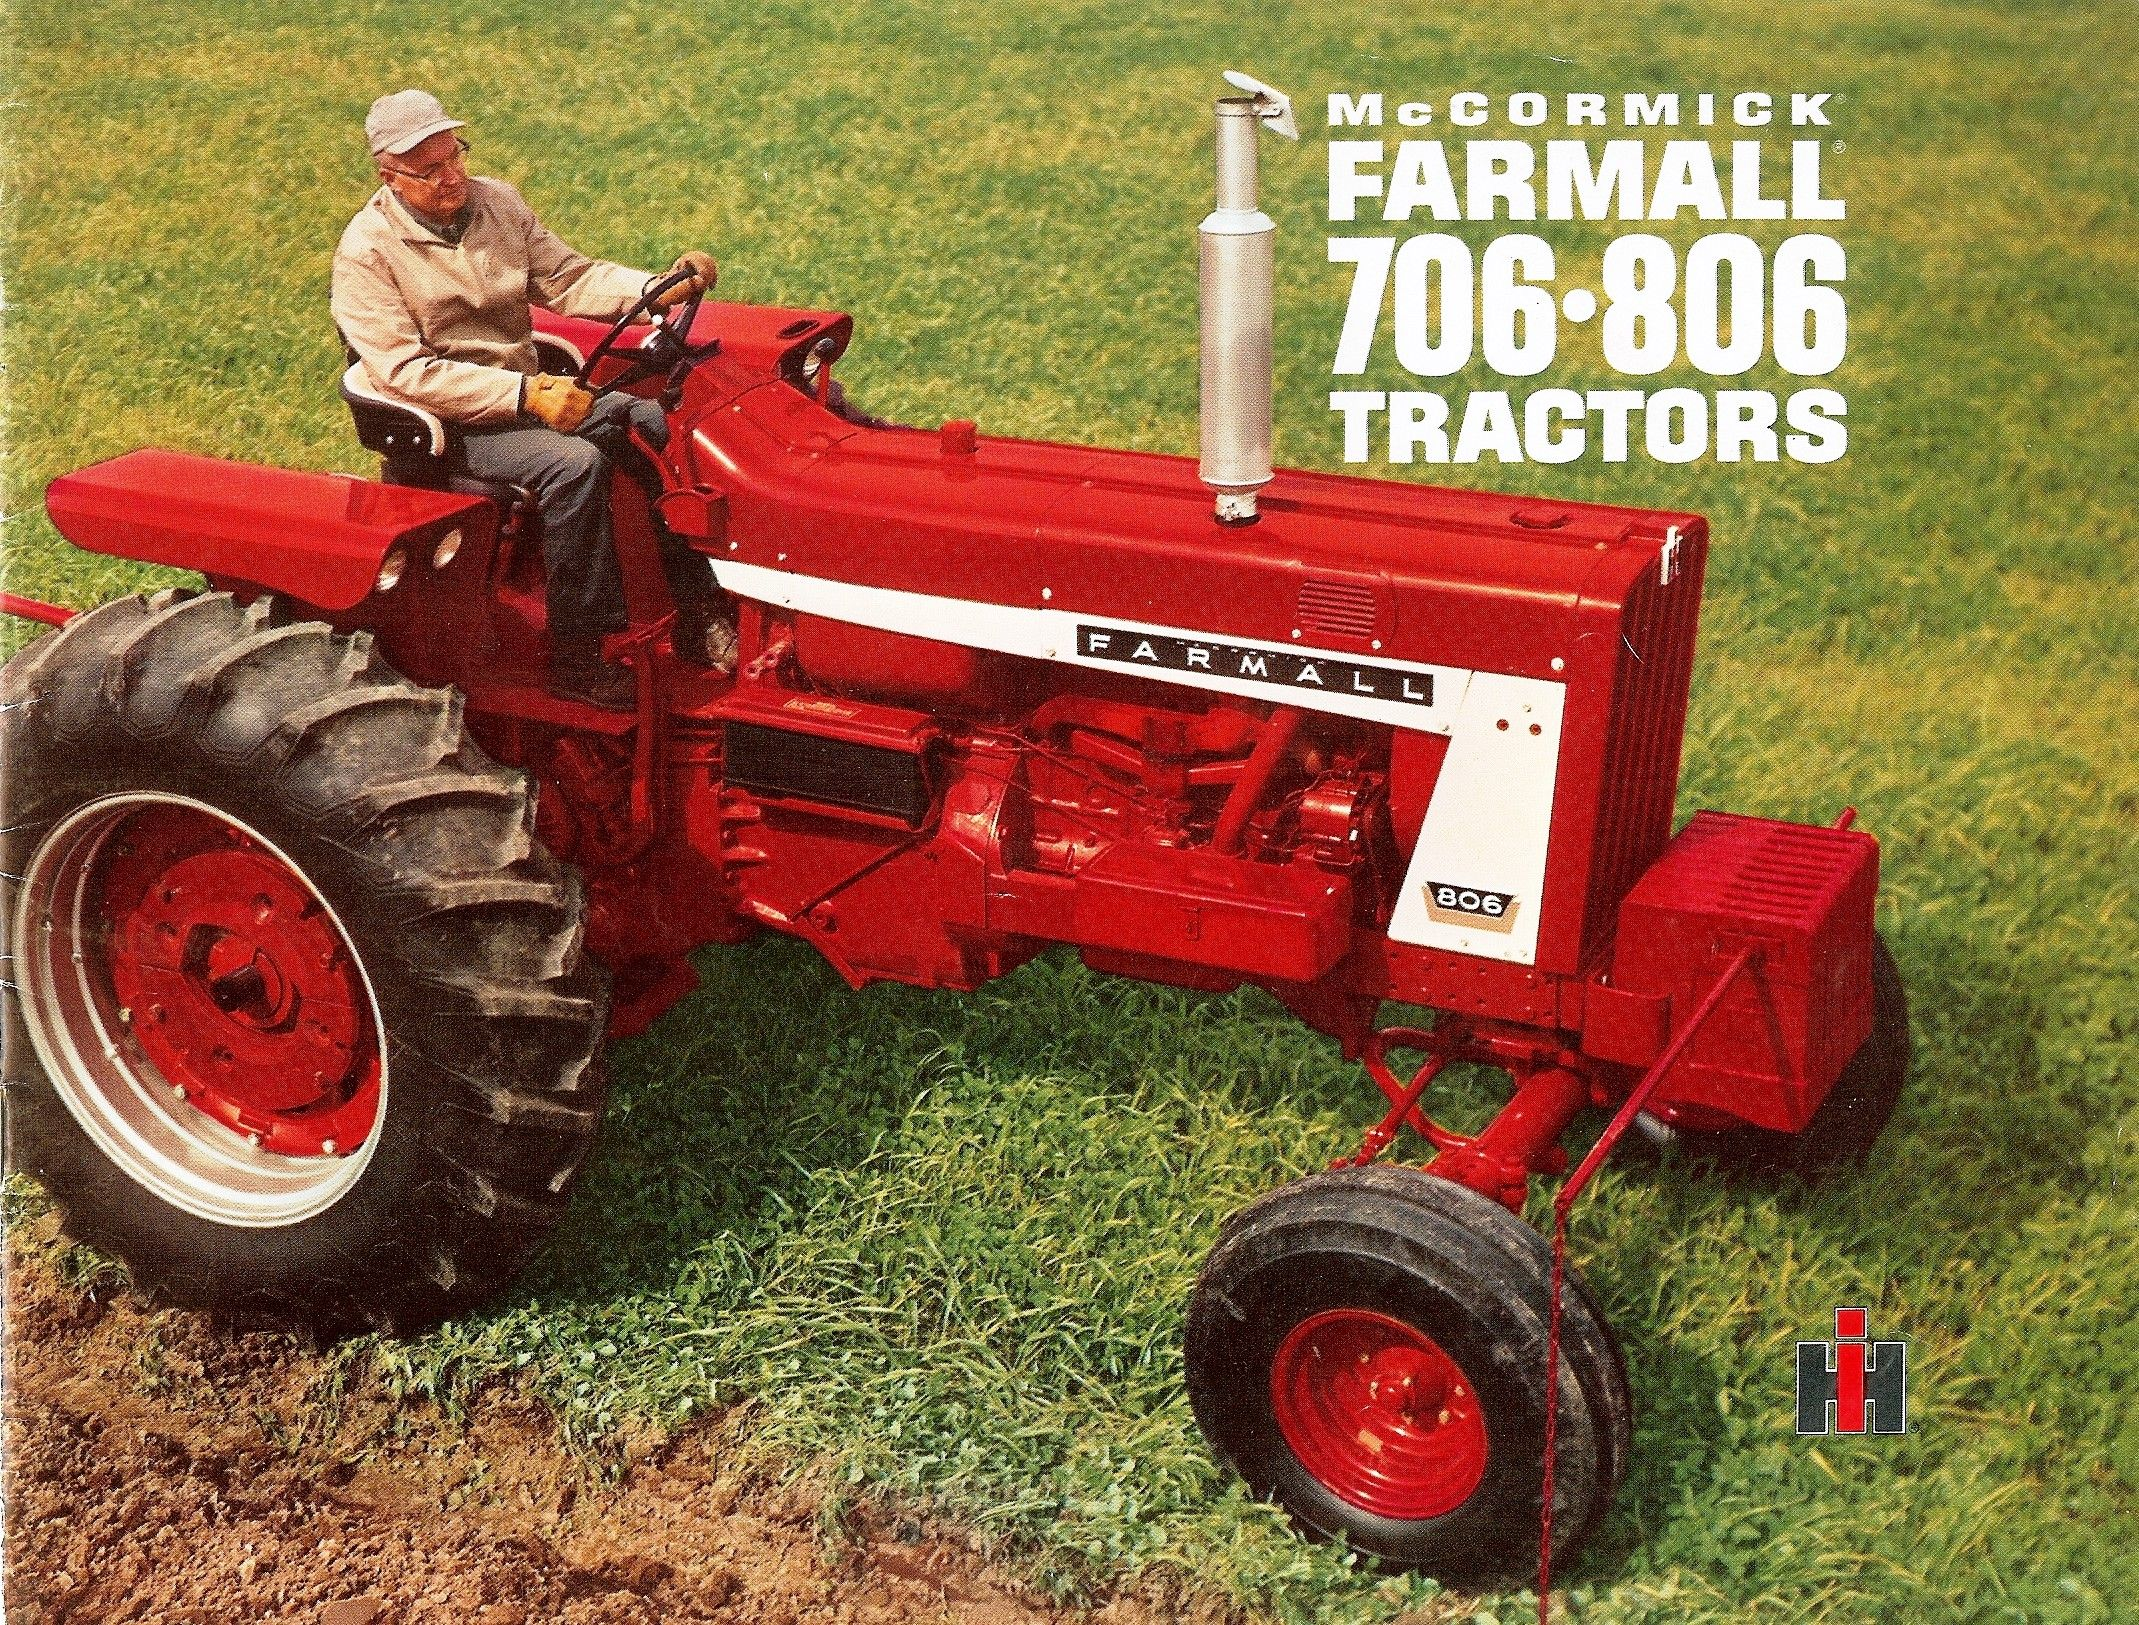 hight resolution of farmall 706 806 tractors international harvester advertising set also 806 farmall tractor wiring harness in addition 560 farmall